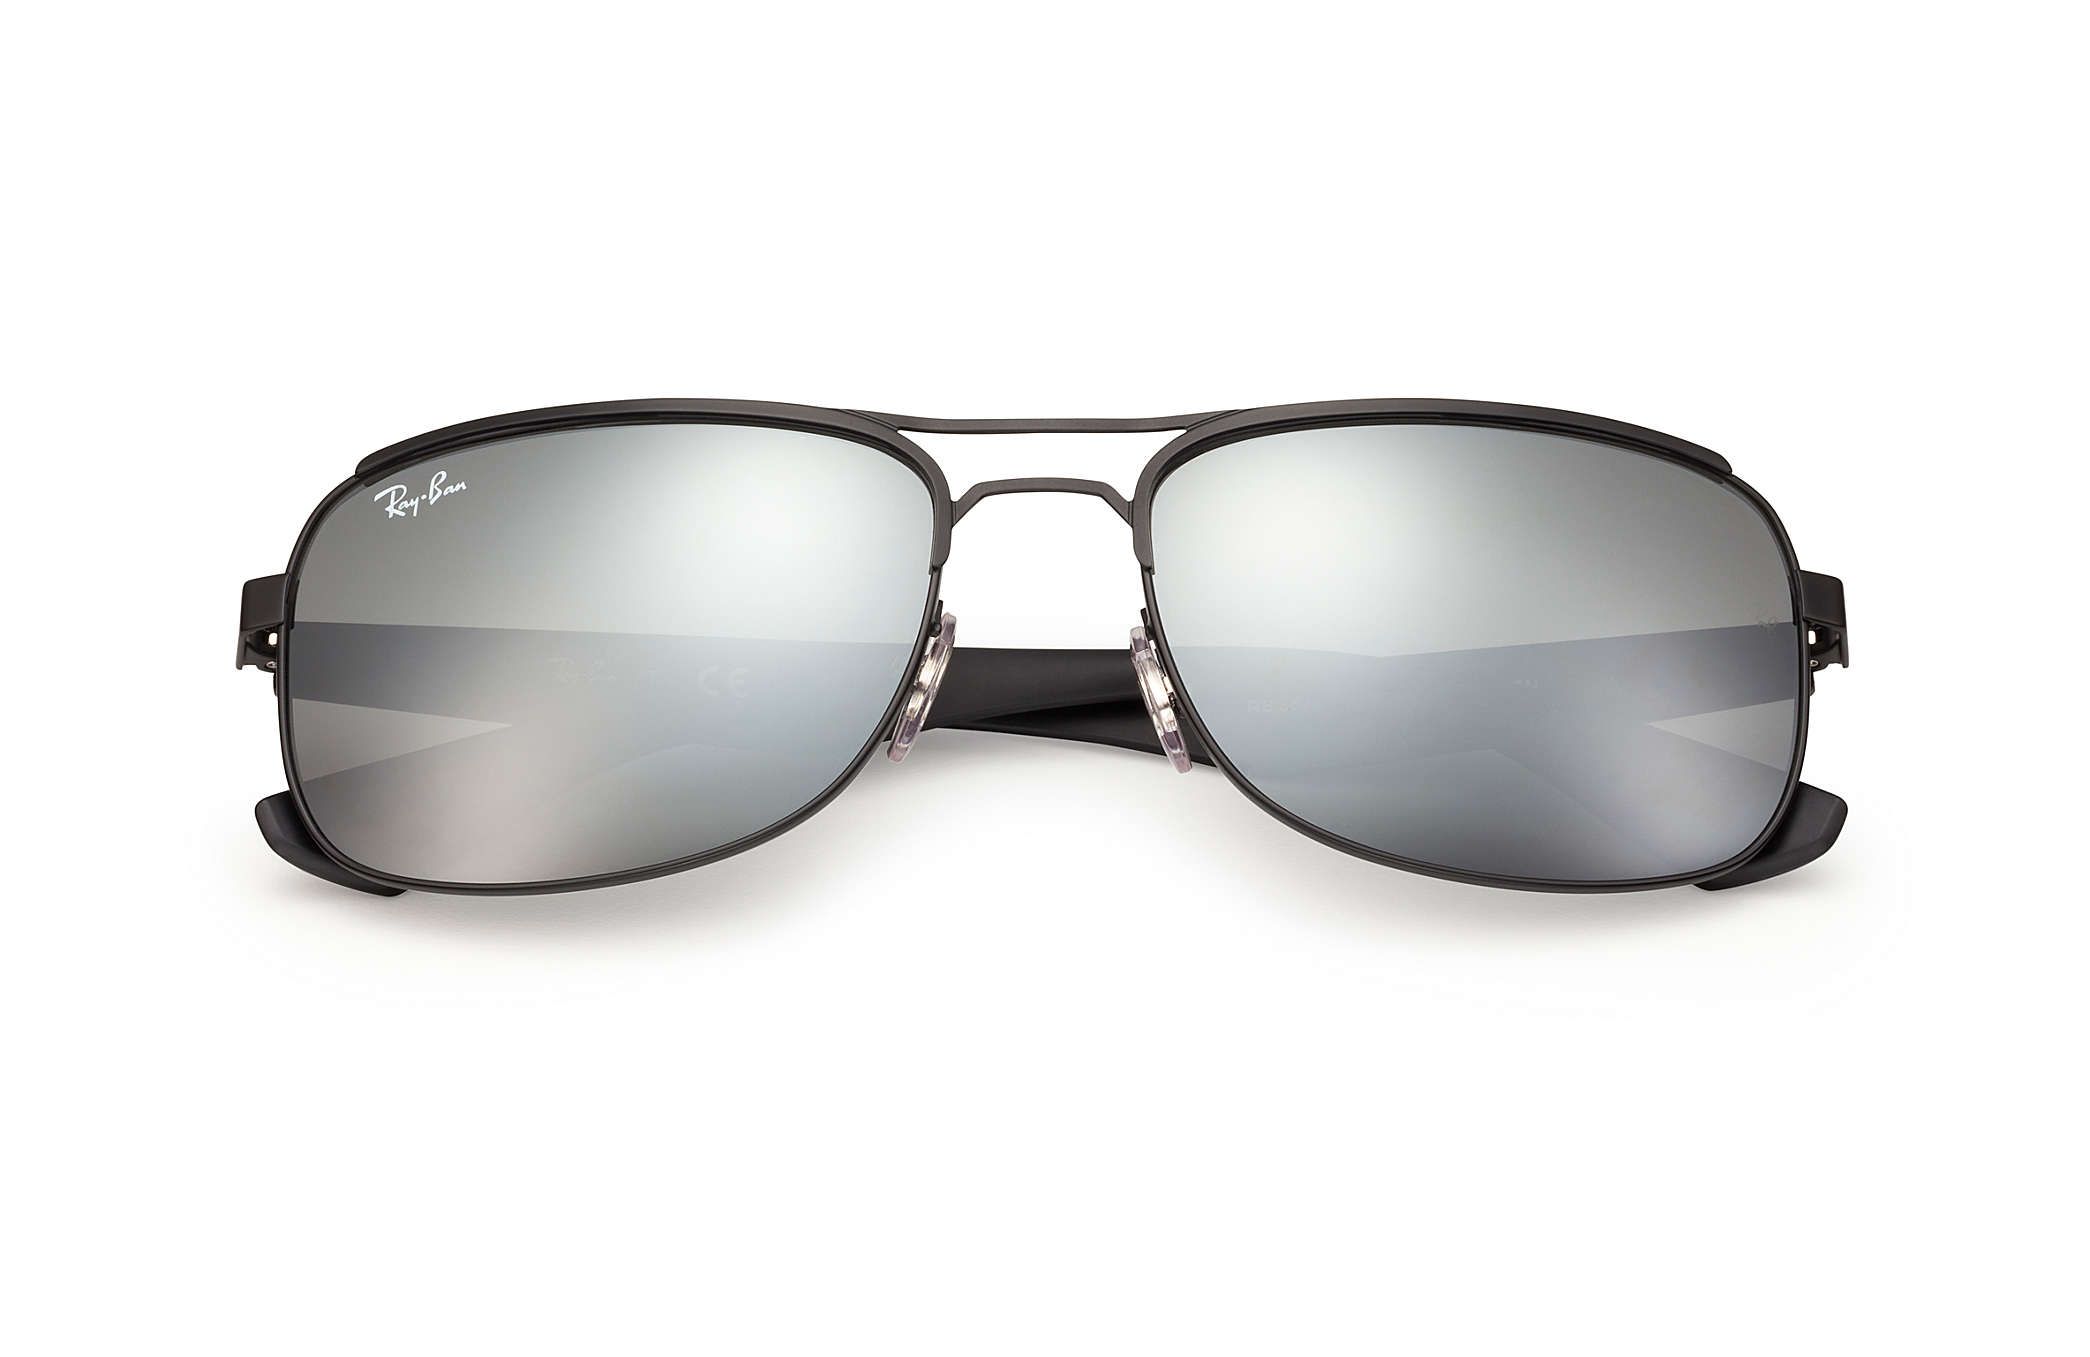 ray ban 3448  Ray-Ban RB3524 Black, Grey Lenses